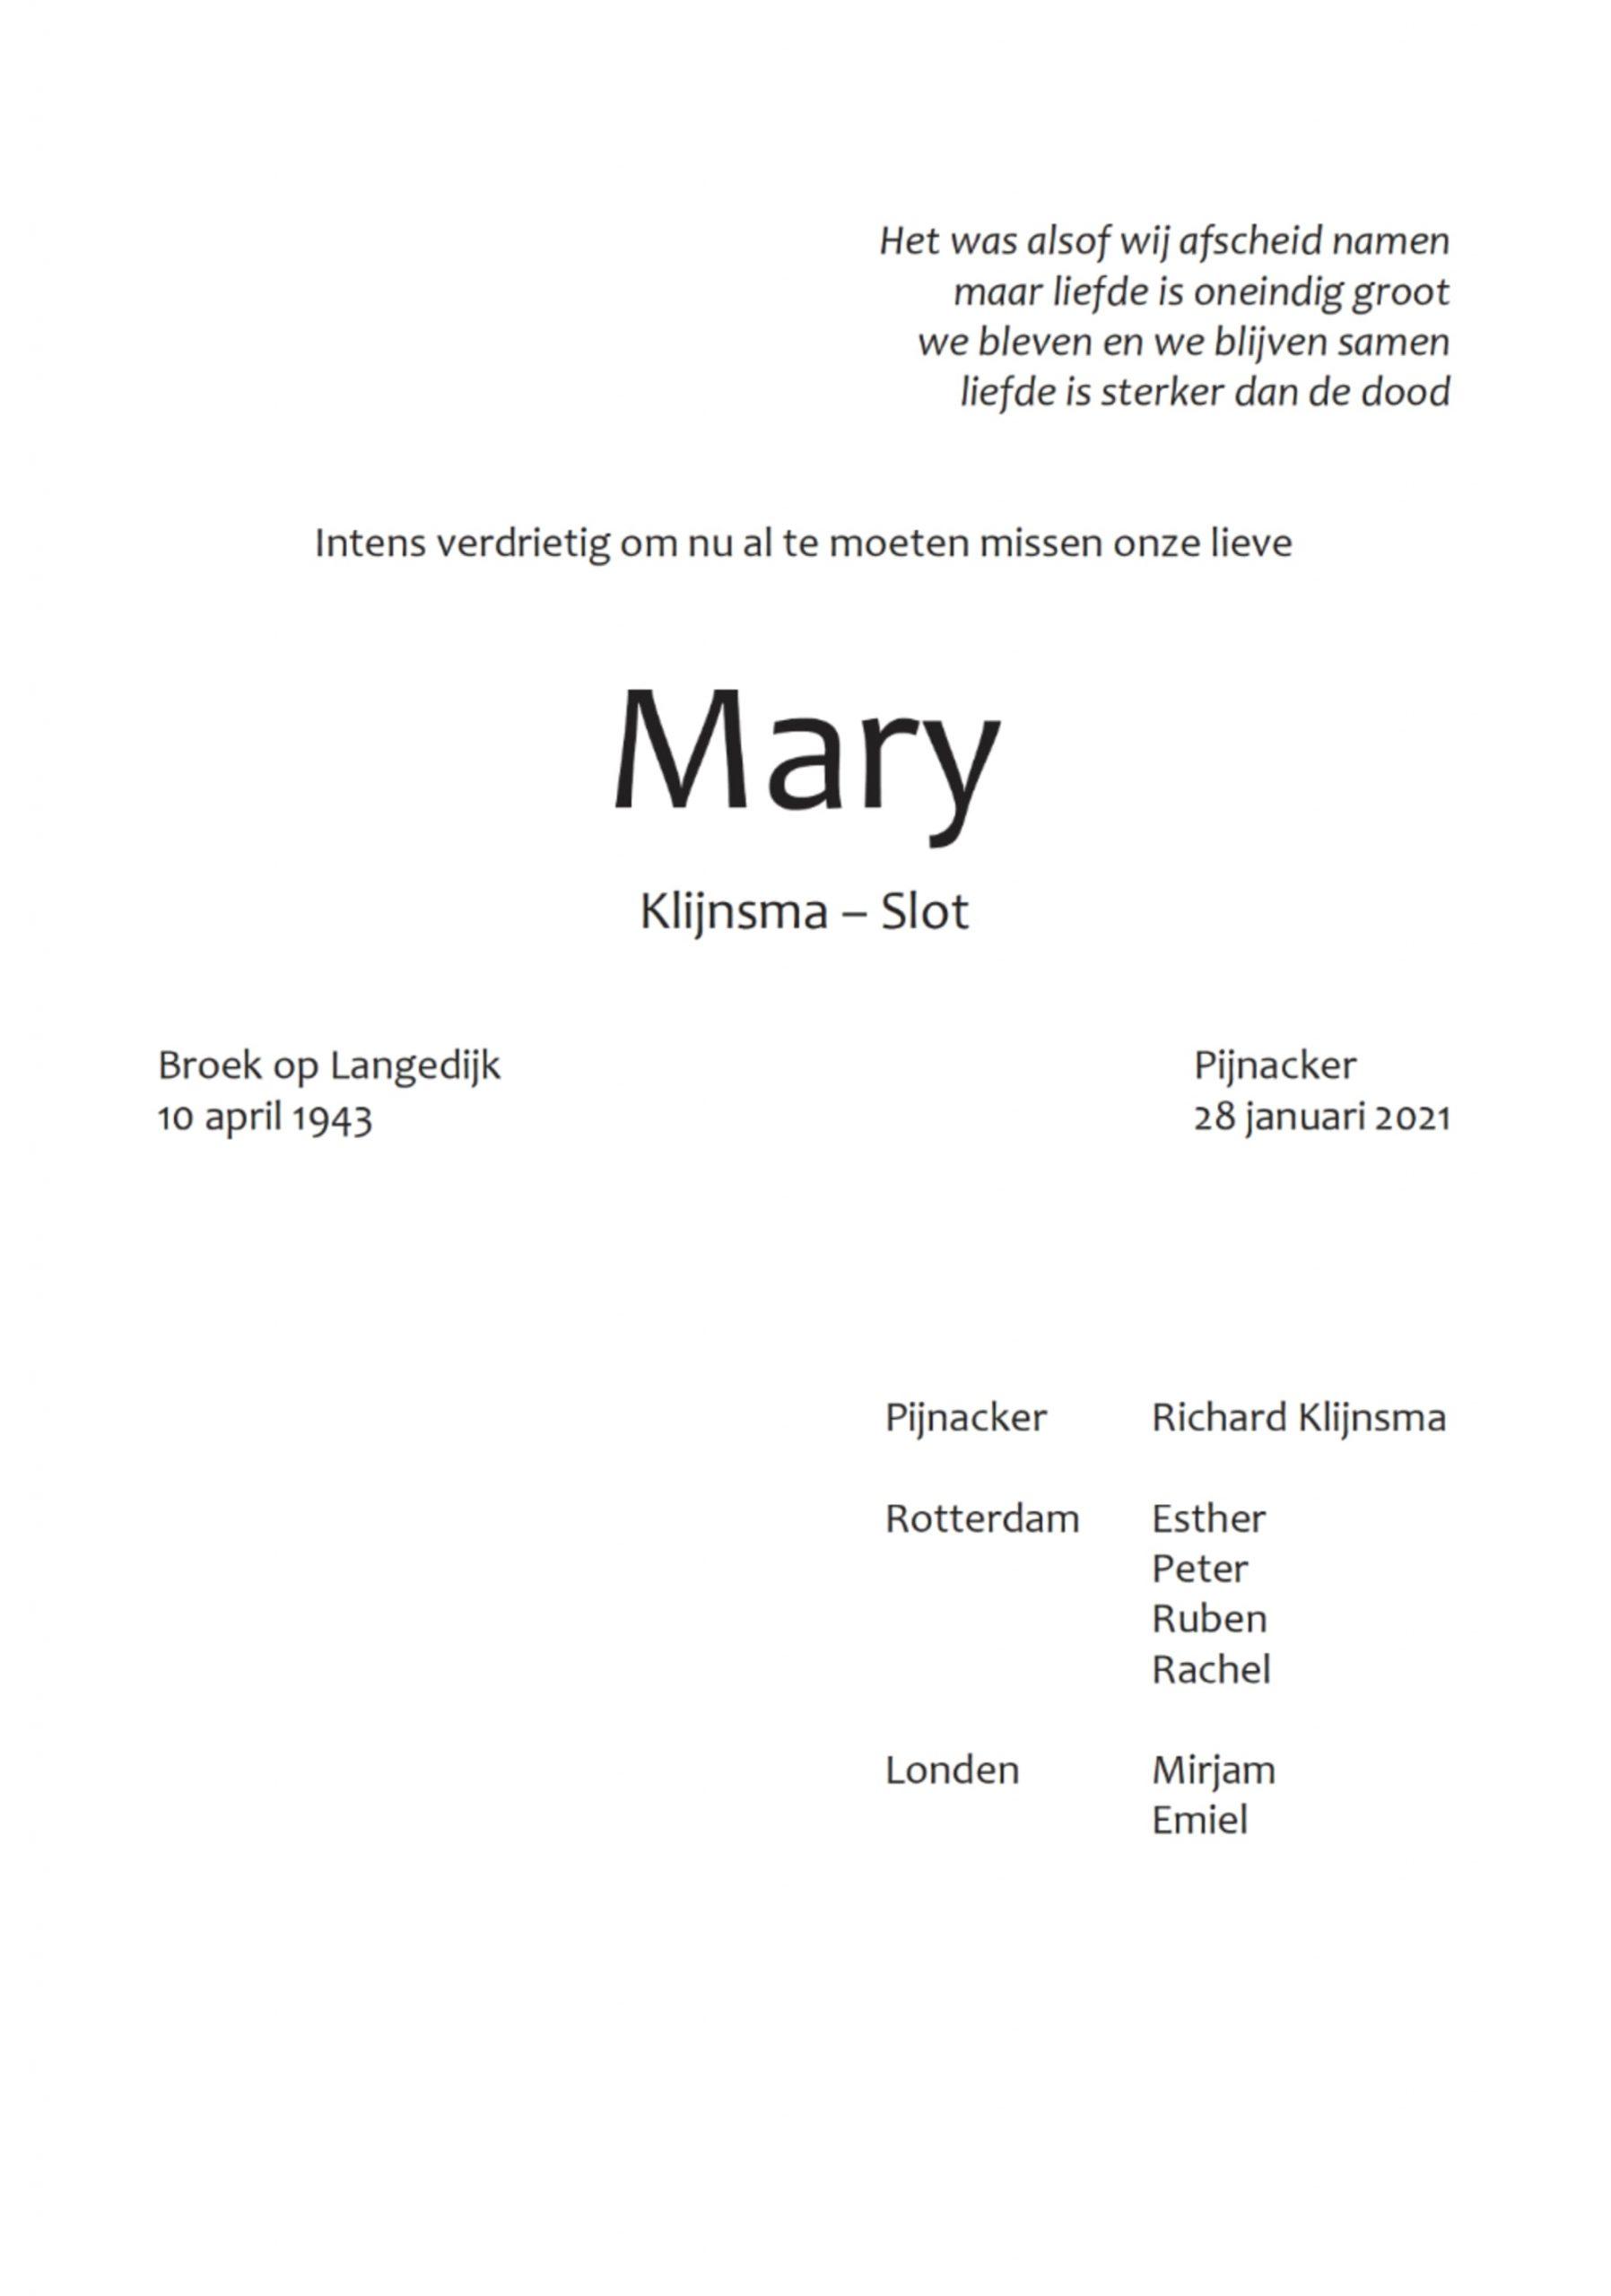 Rouwkaart midden rechts Mary Klijnsma - Slot